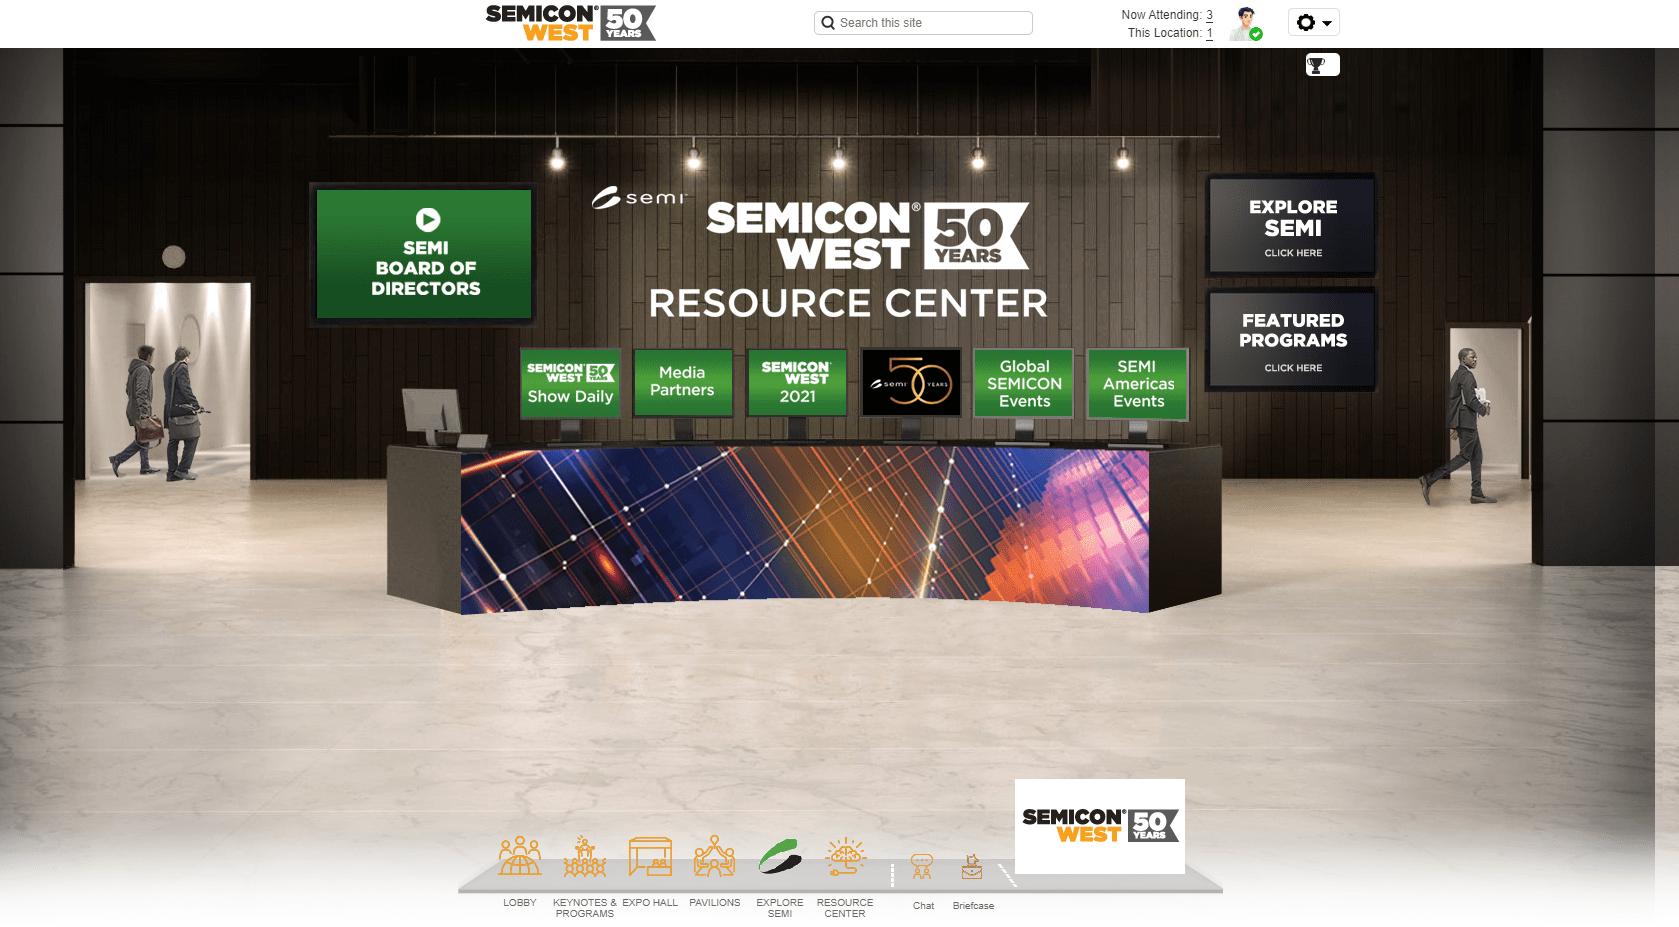 SEMI_US_Resource